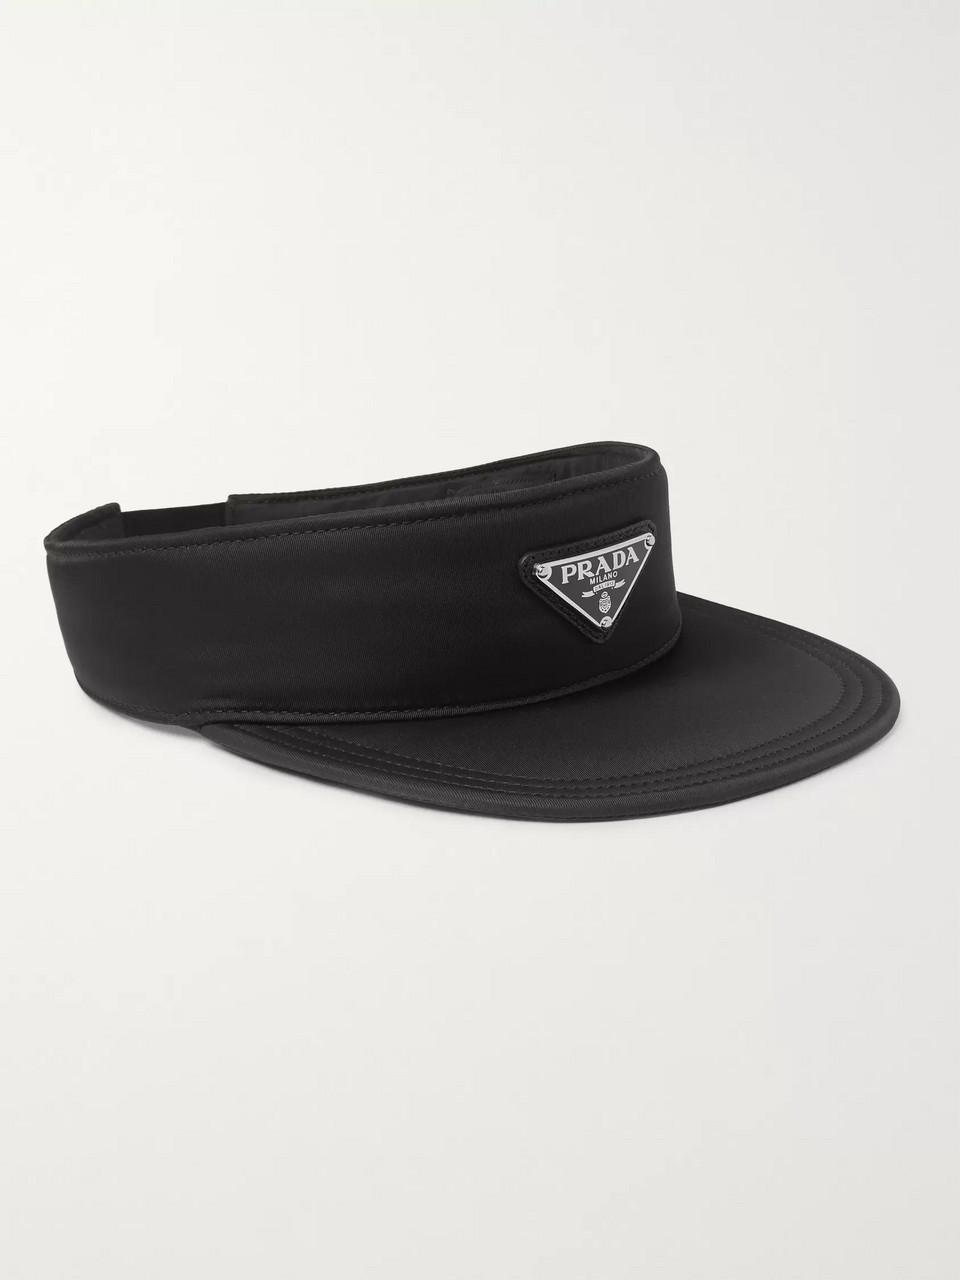 b06cf453 Black Logo-Appliquéd Nylon Visor   Prada   MR PORTER